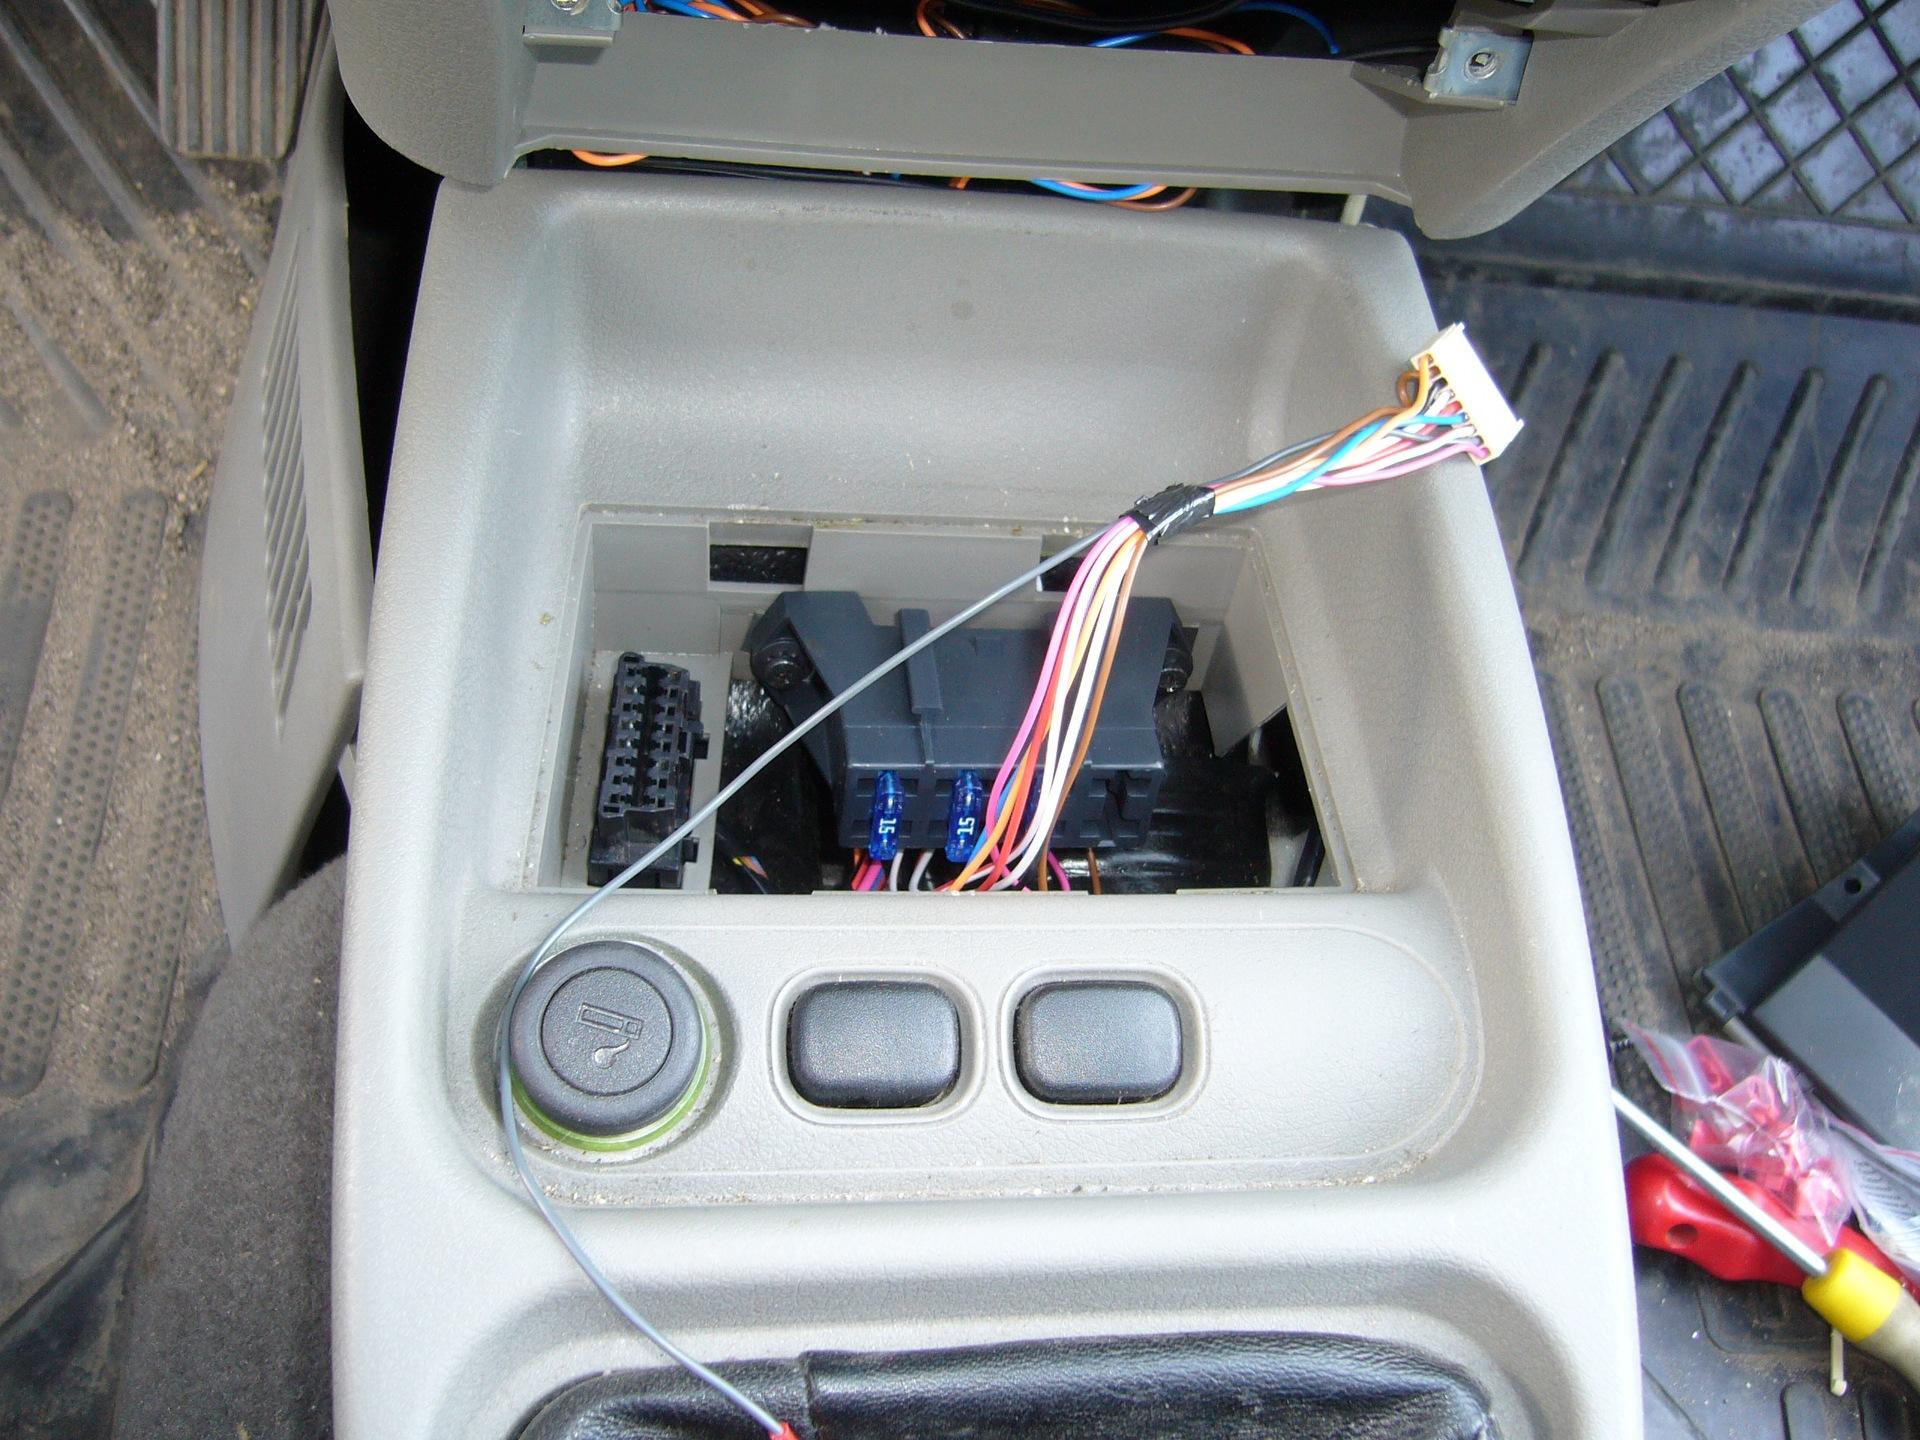 Бортовой компьютер - бортжурнал Лада Калина Универсал WhiteUser 2011 года на DRIVE2